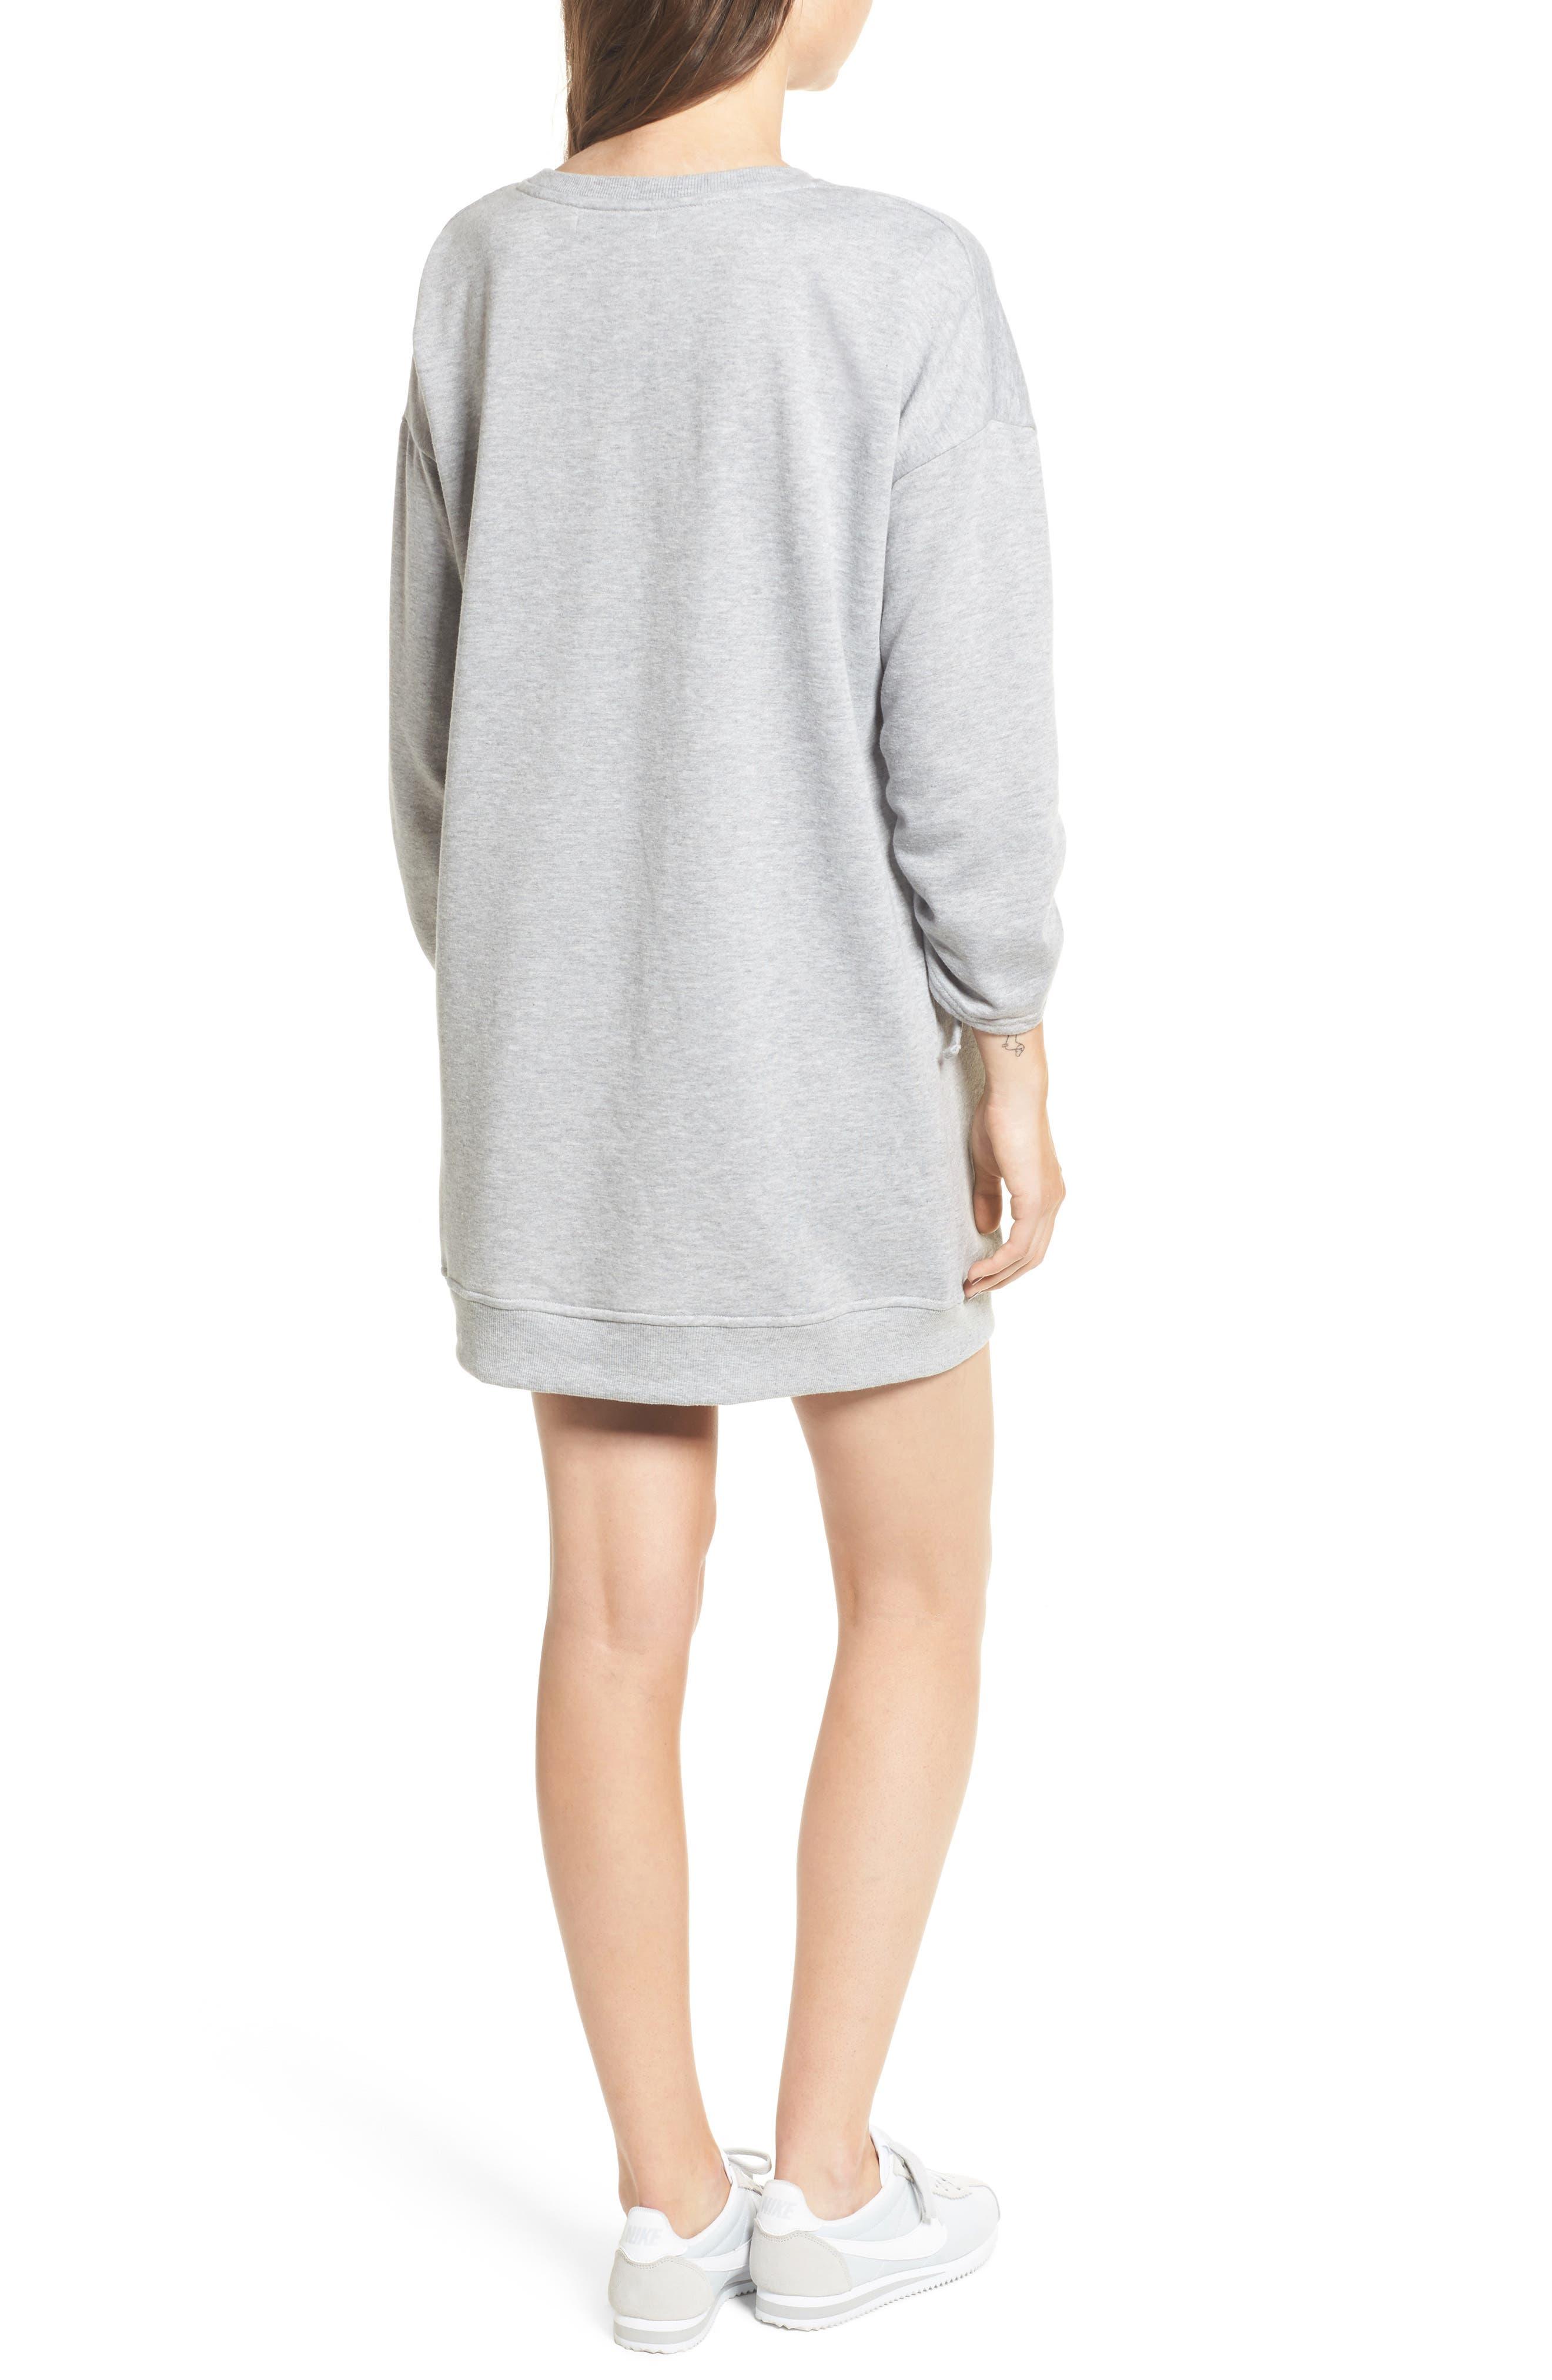 Ruched Sleeve Sweatshirt Dress,                             Alternate thumbnail 2, color,                             020